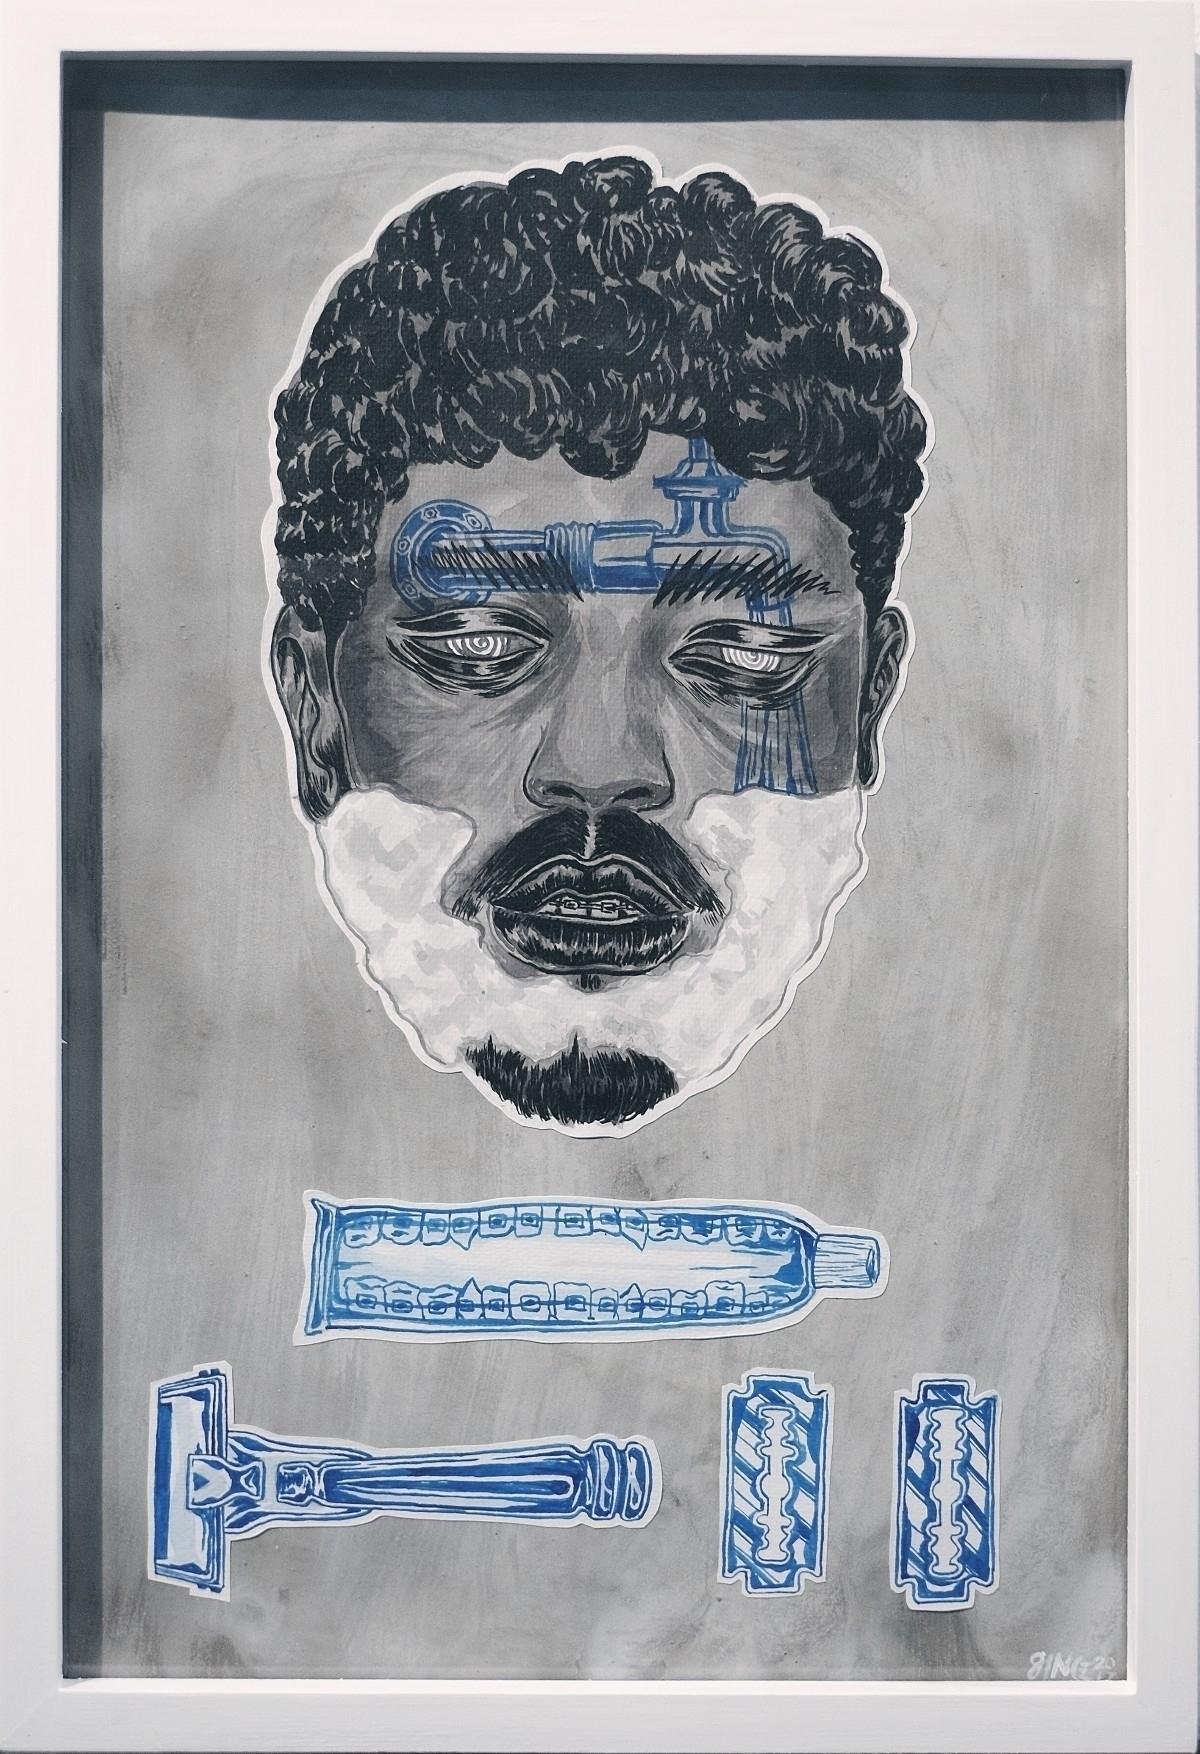 WATERWORKS Ink Watercolor Paper - ginoe | ello